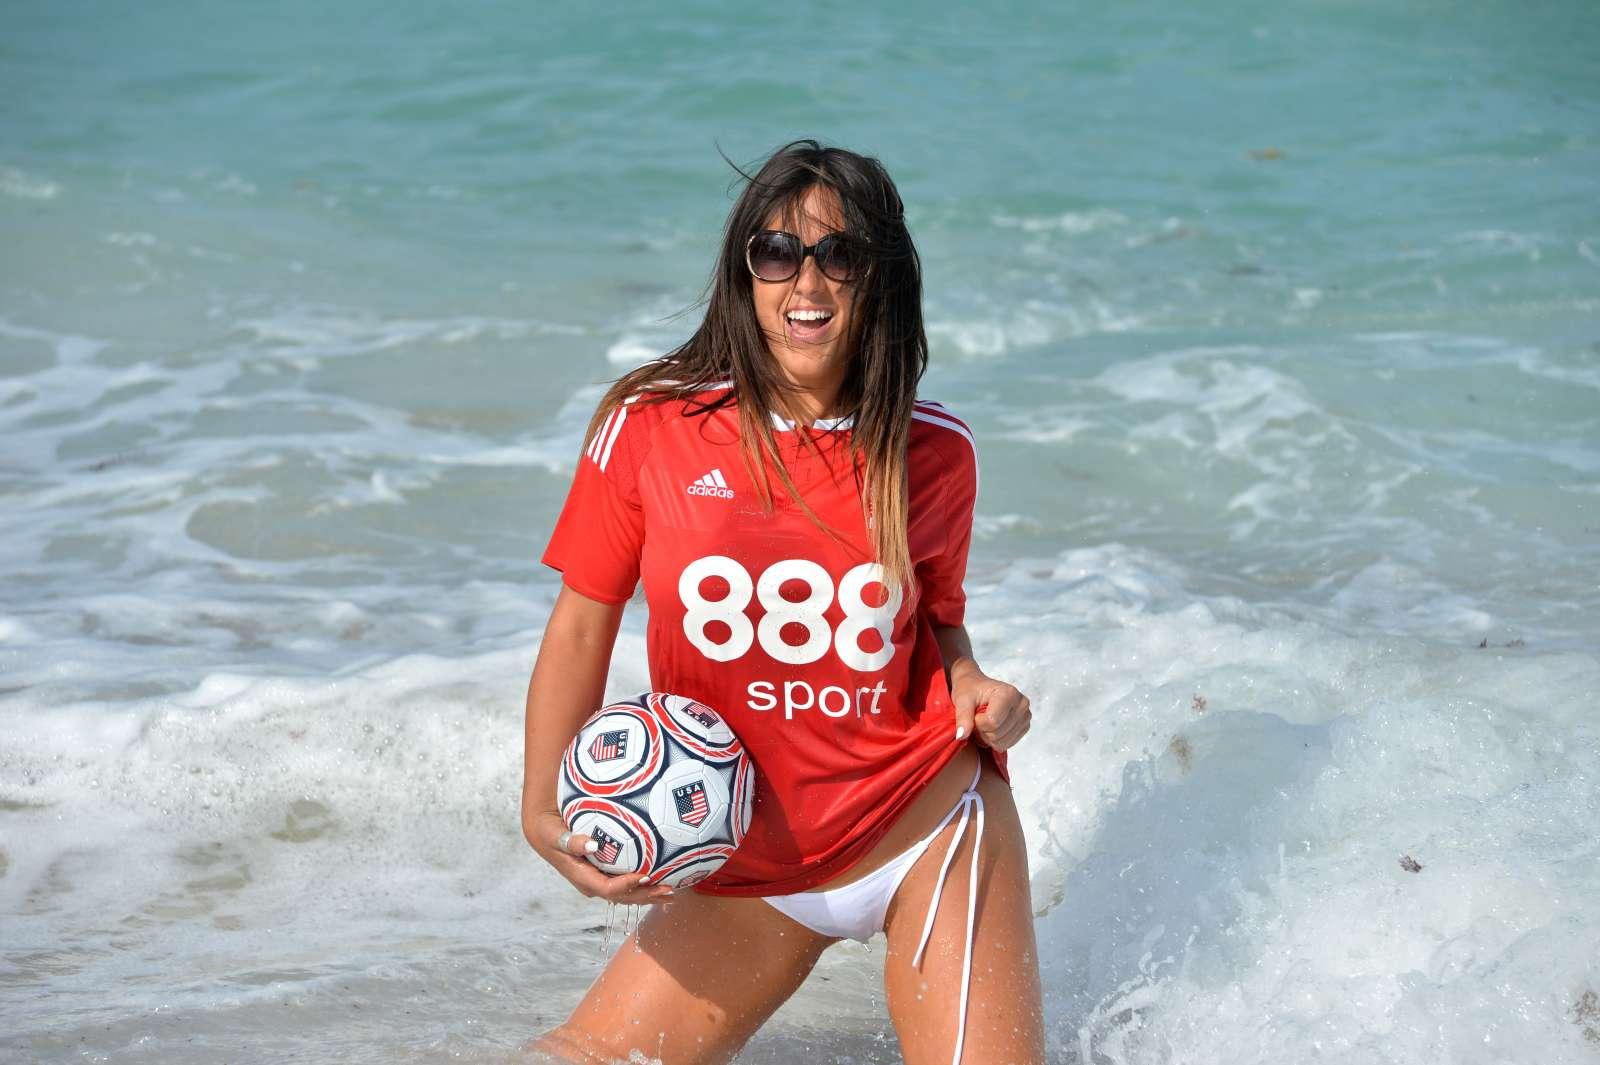 Claudia Romani in Bikini Bottom Shoot for Calendar in Fort Lauderdale